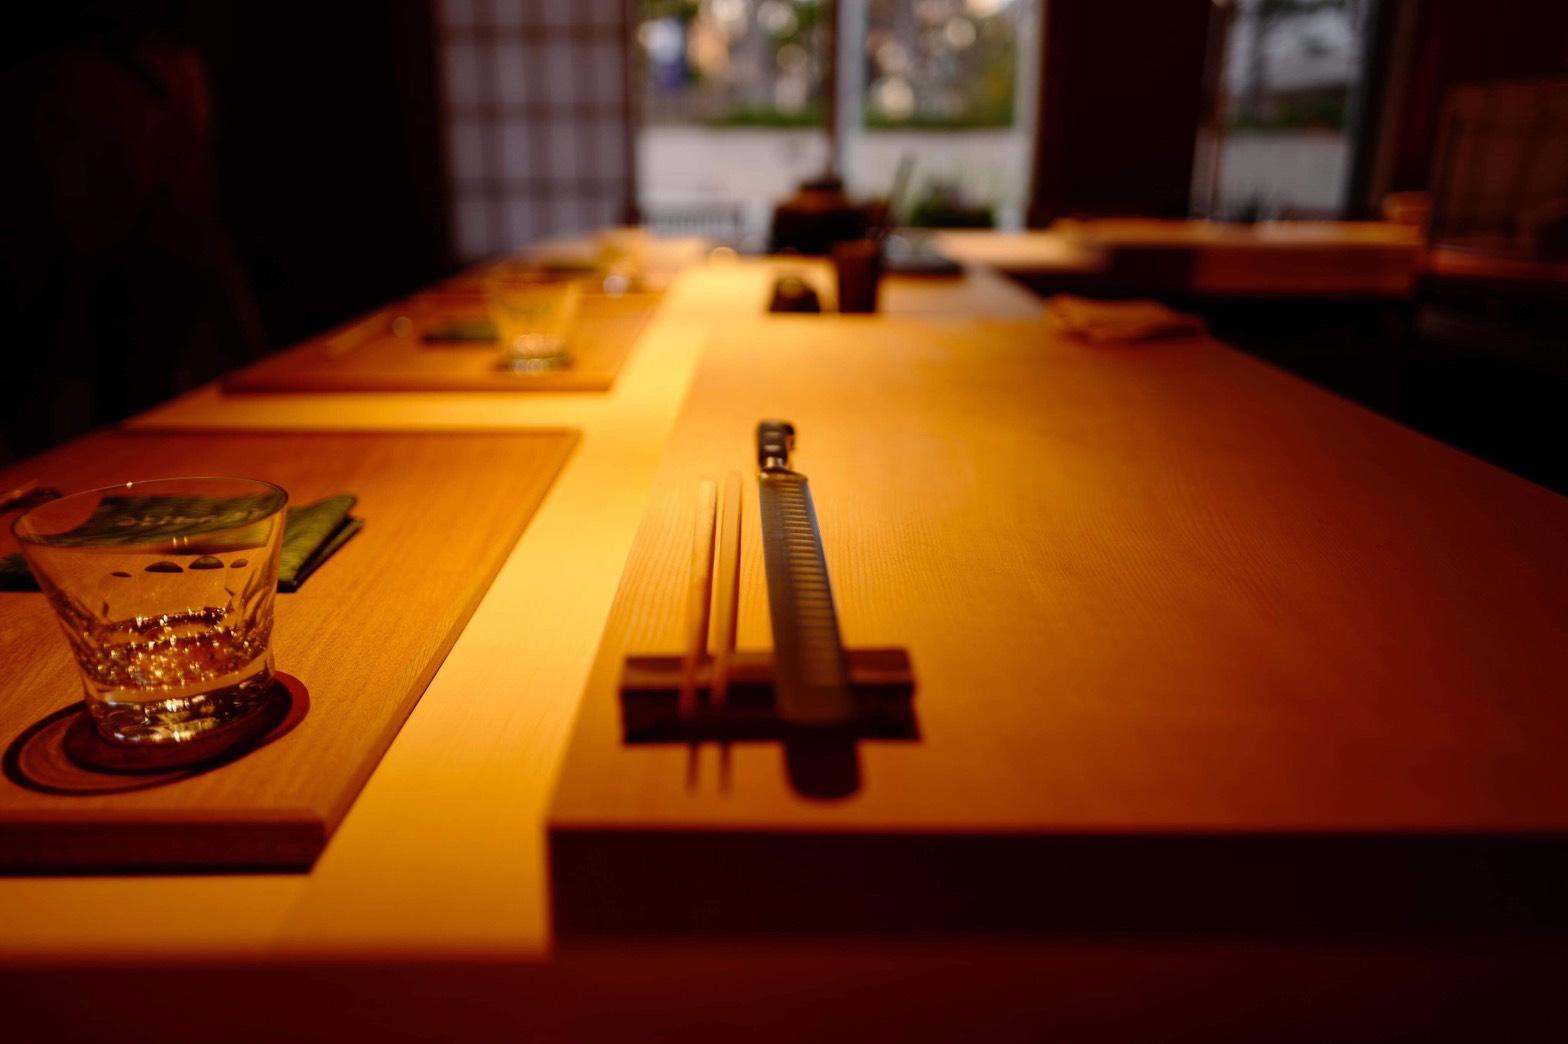 Shimoyamite Naeizuruの3枚目のカバー写真